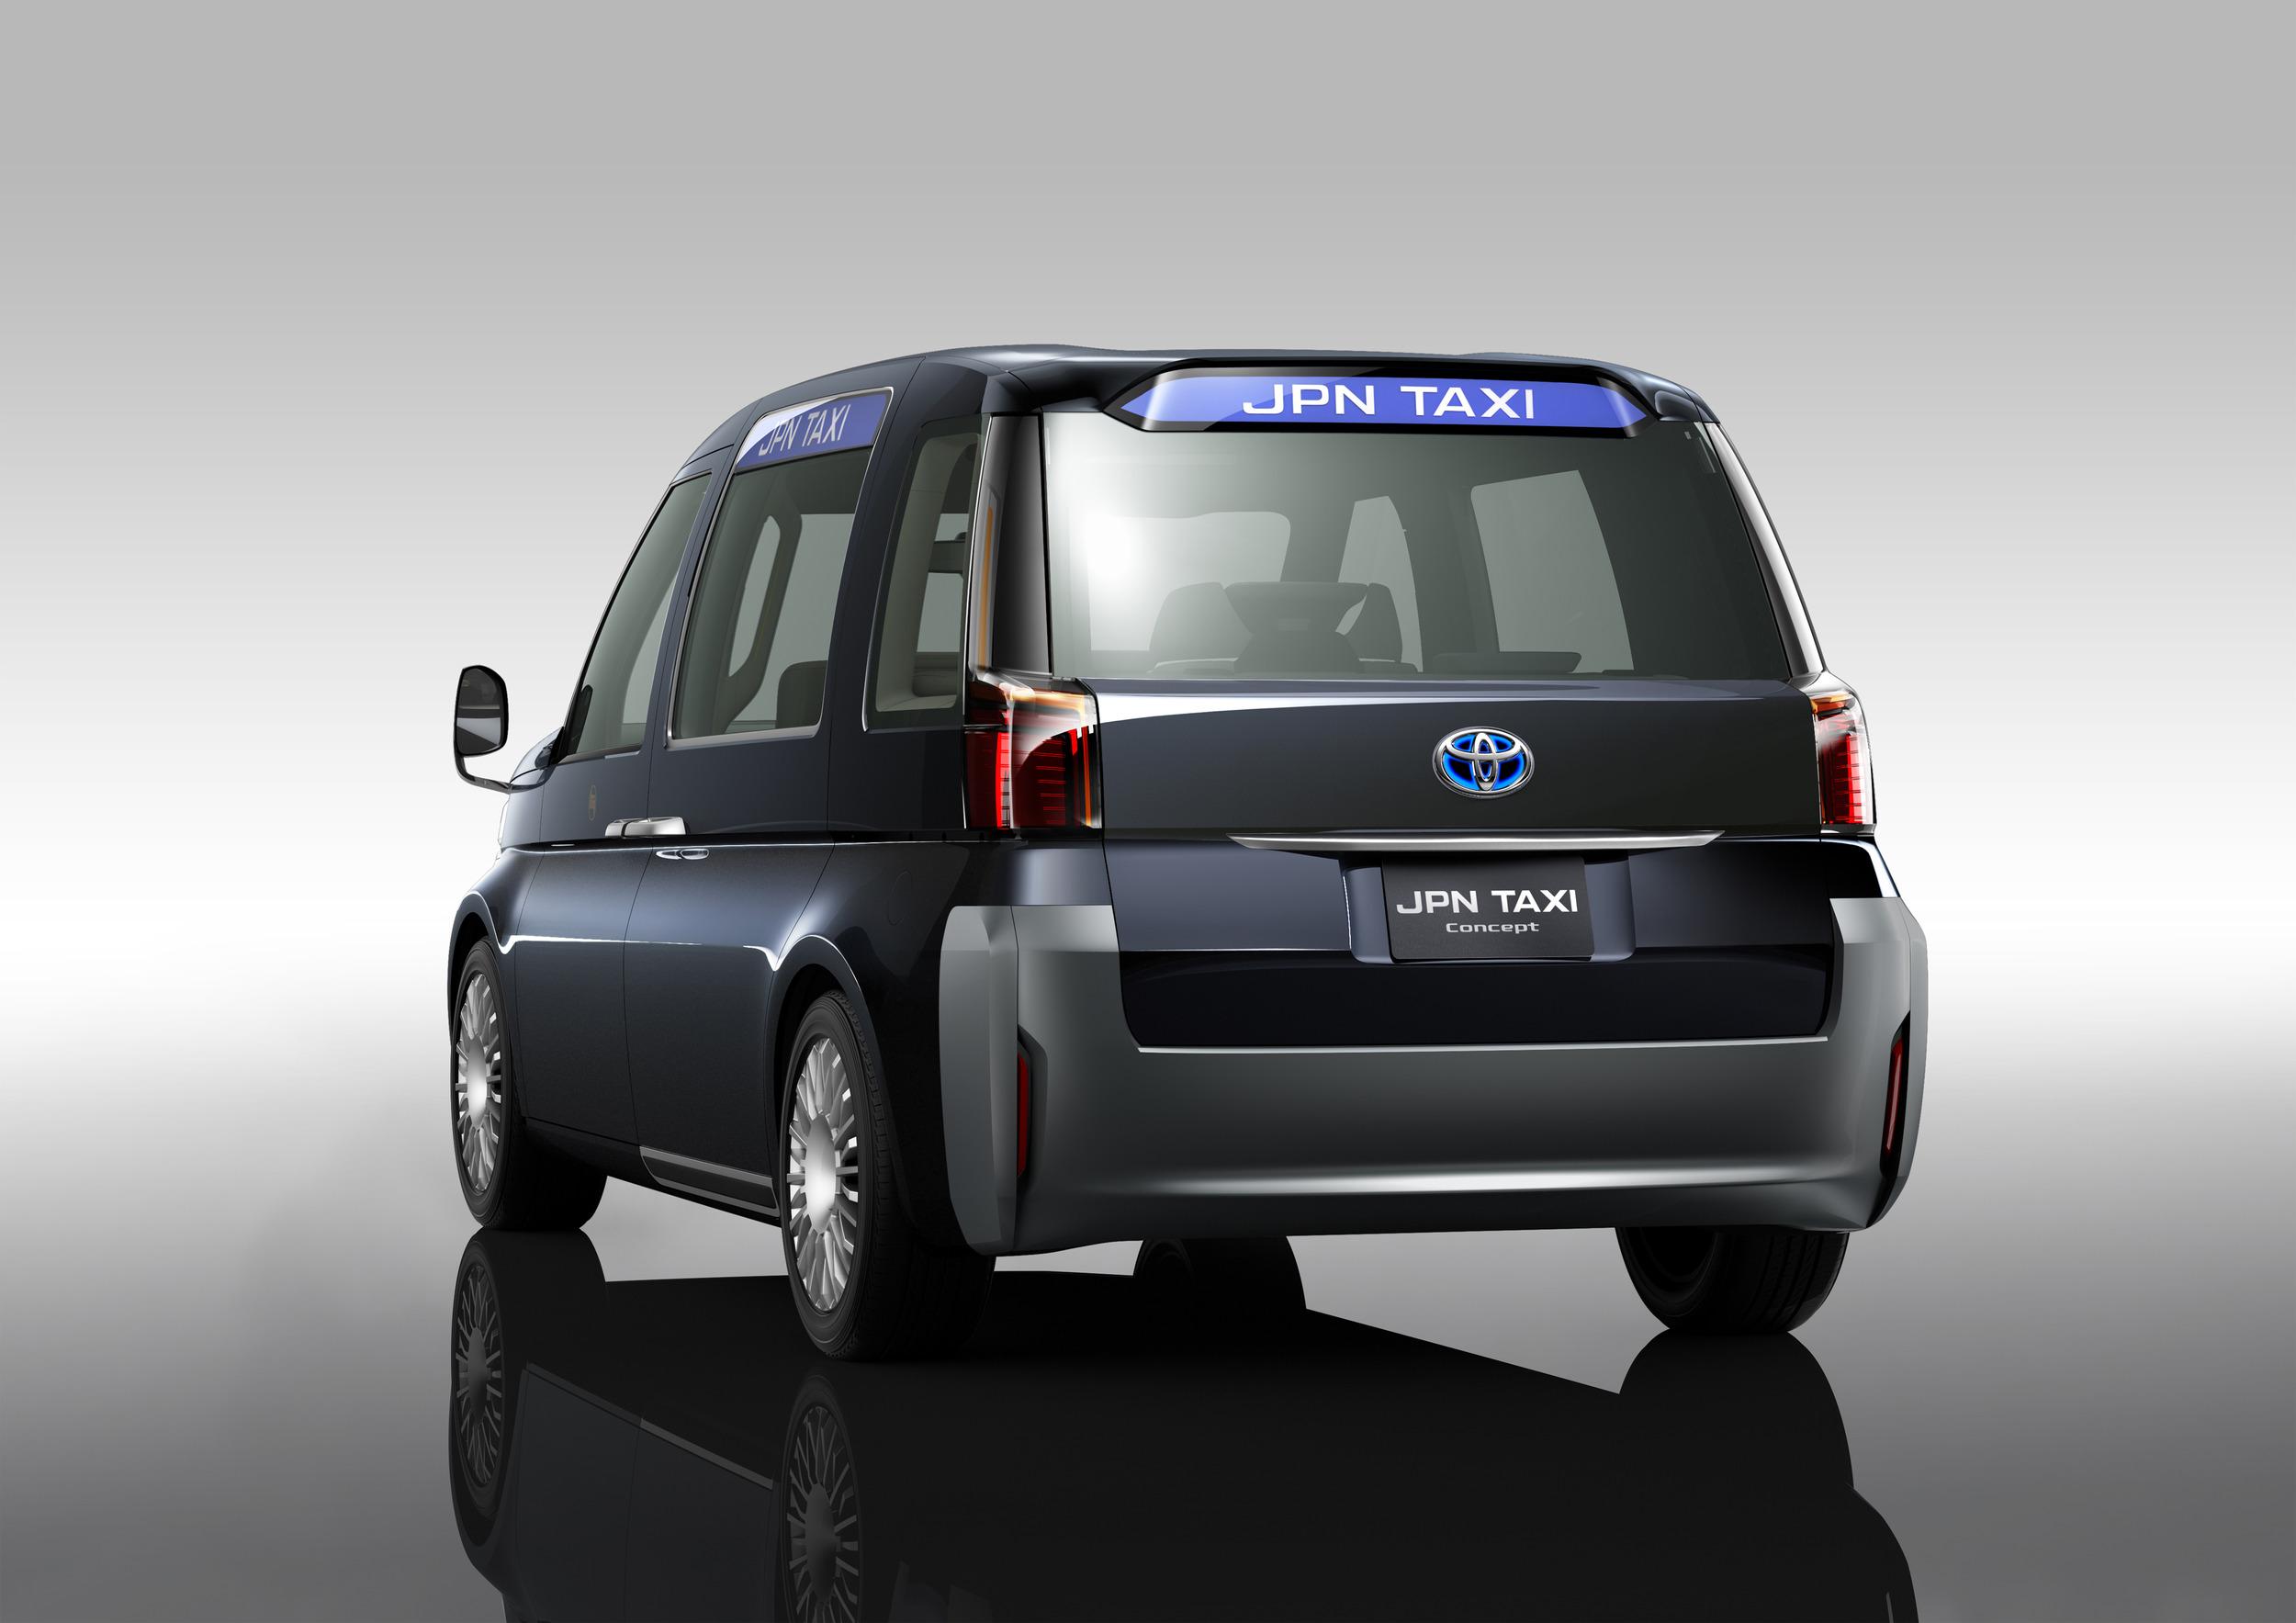 toyota-jpn-taxi-concept-2013-tokyo-motor-show-001-1